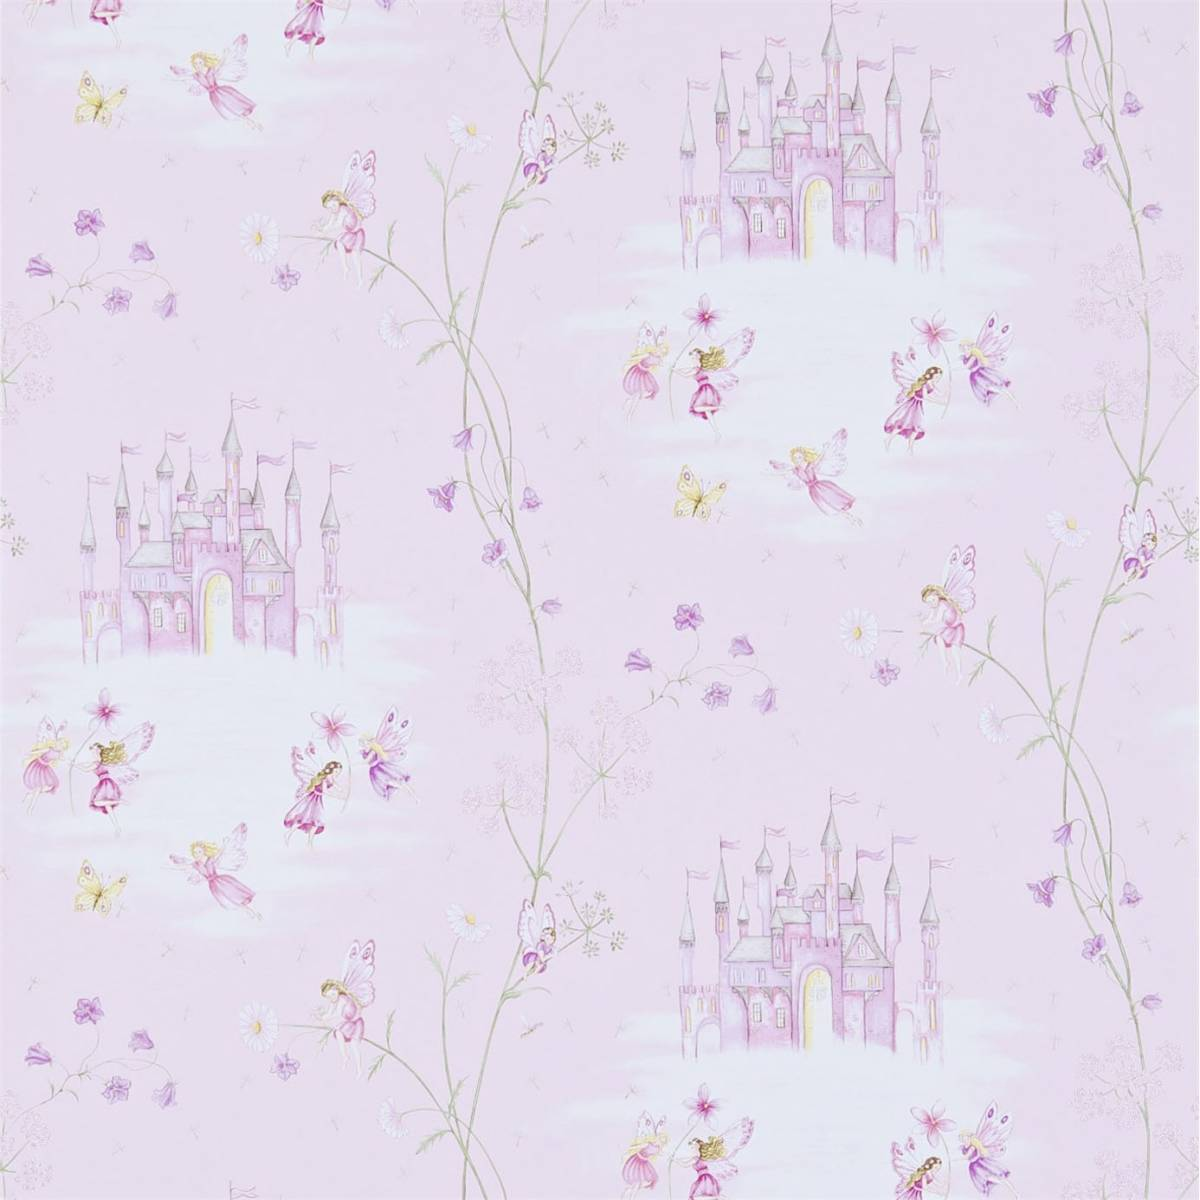 Sanderson Abracazoo Fabrics Wallpapers Fairy Castle Wallpaper